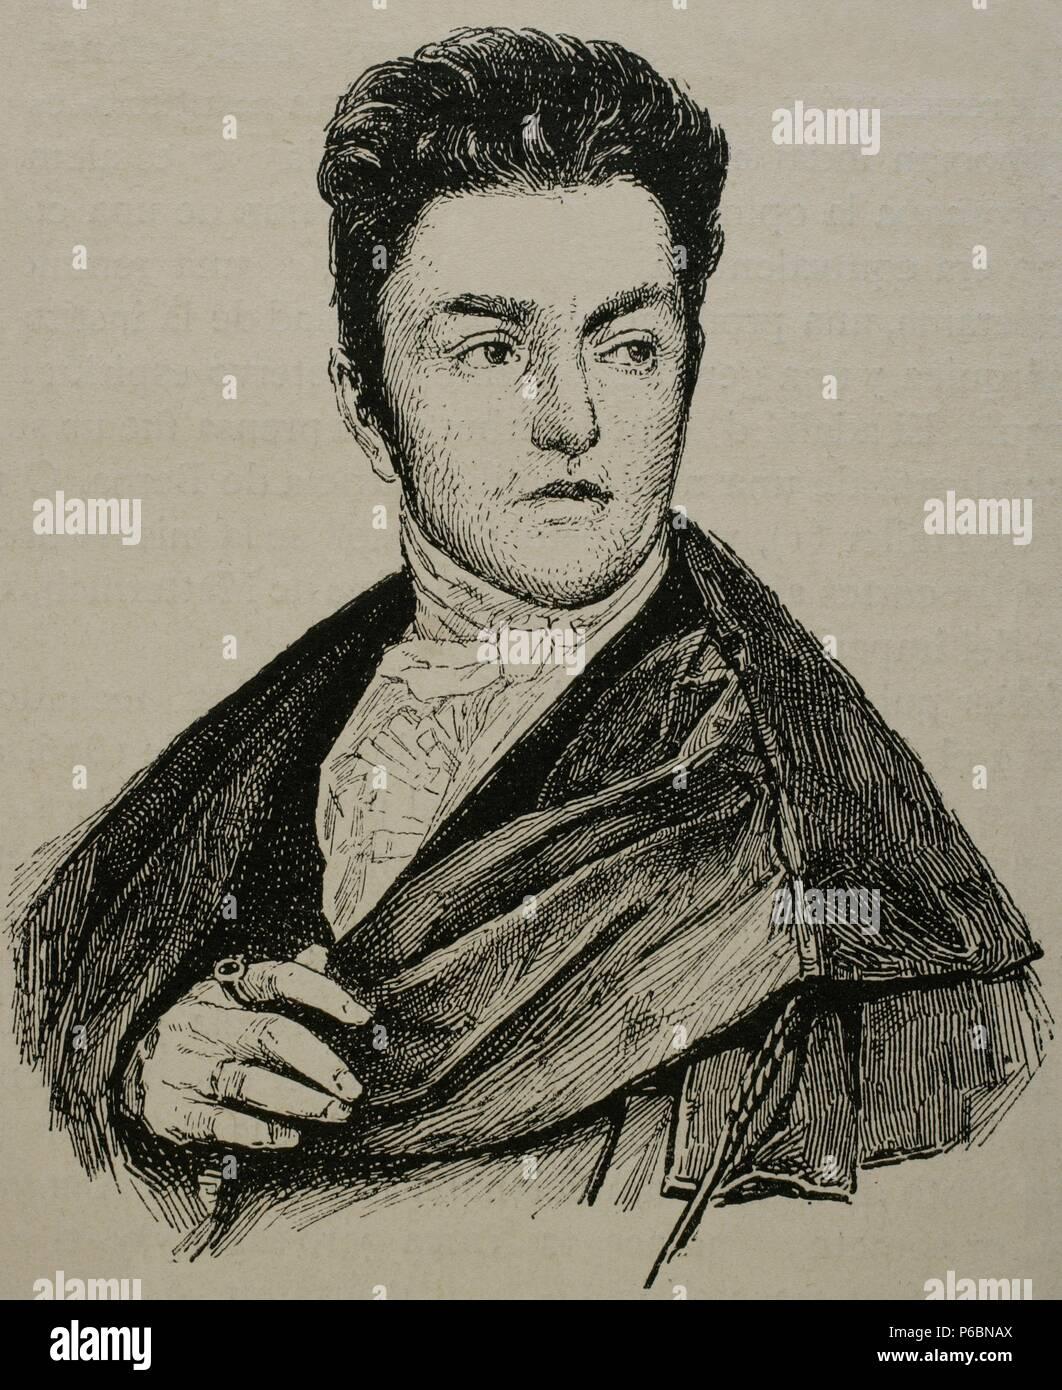 Maximilian Emanuel von Lerchenfeld (1778-1843). Germany. Engraving by Historia Universal, 1883. - Stock Image